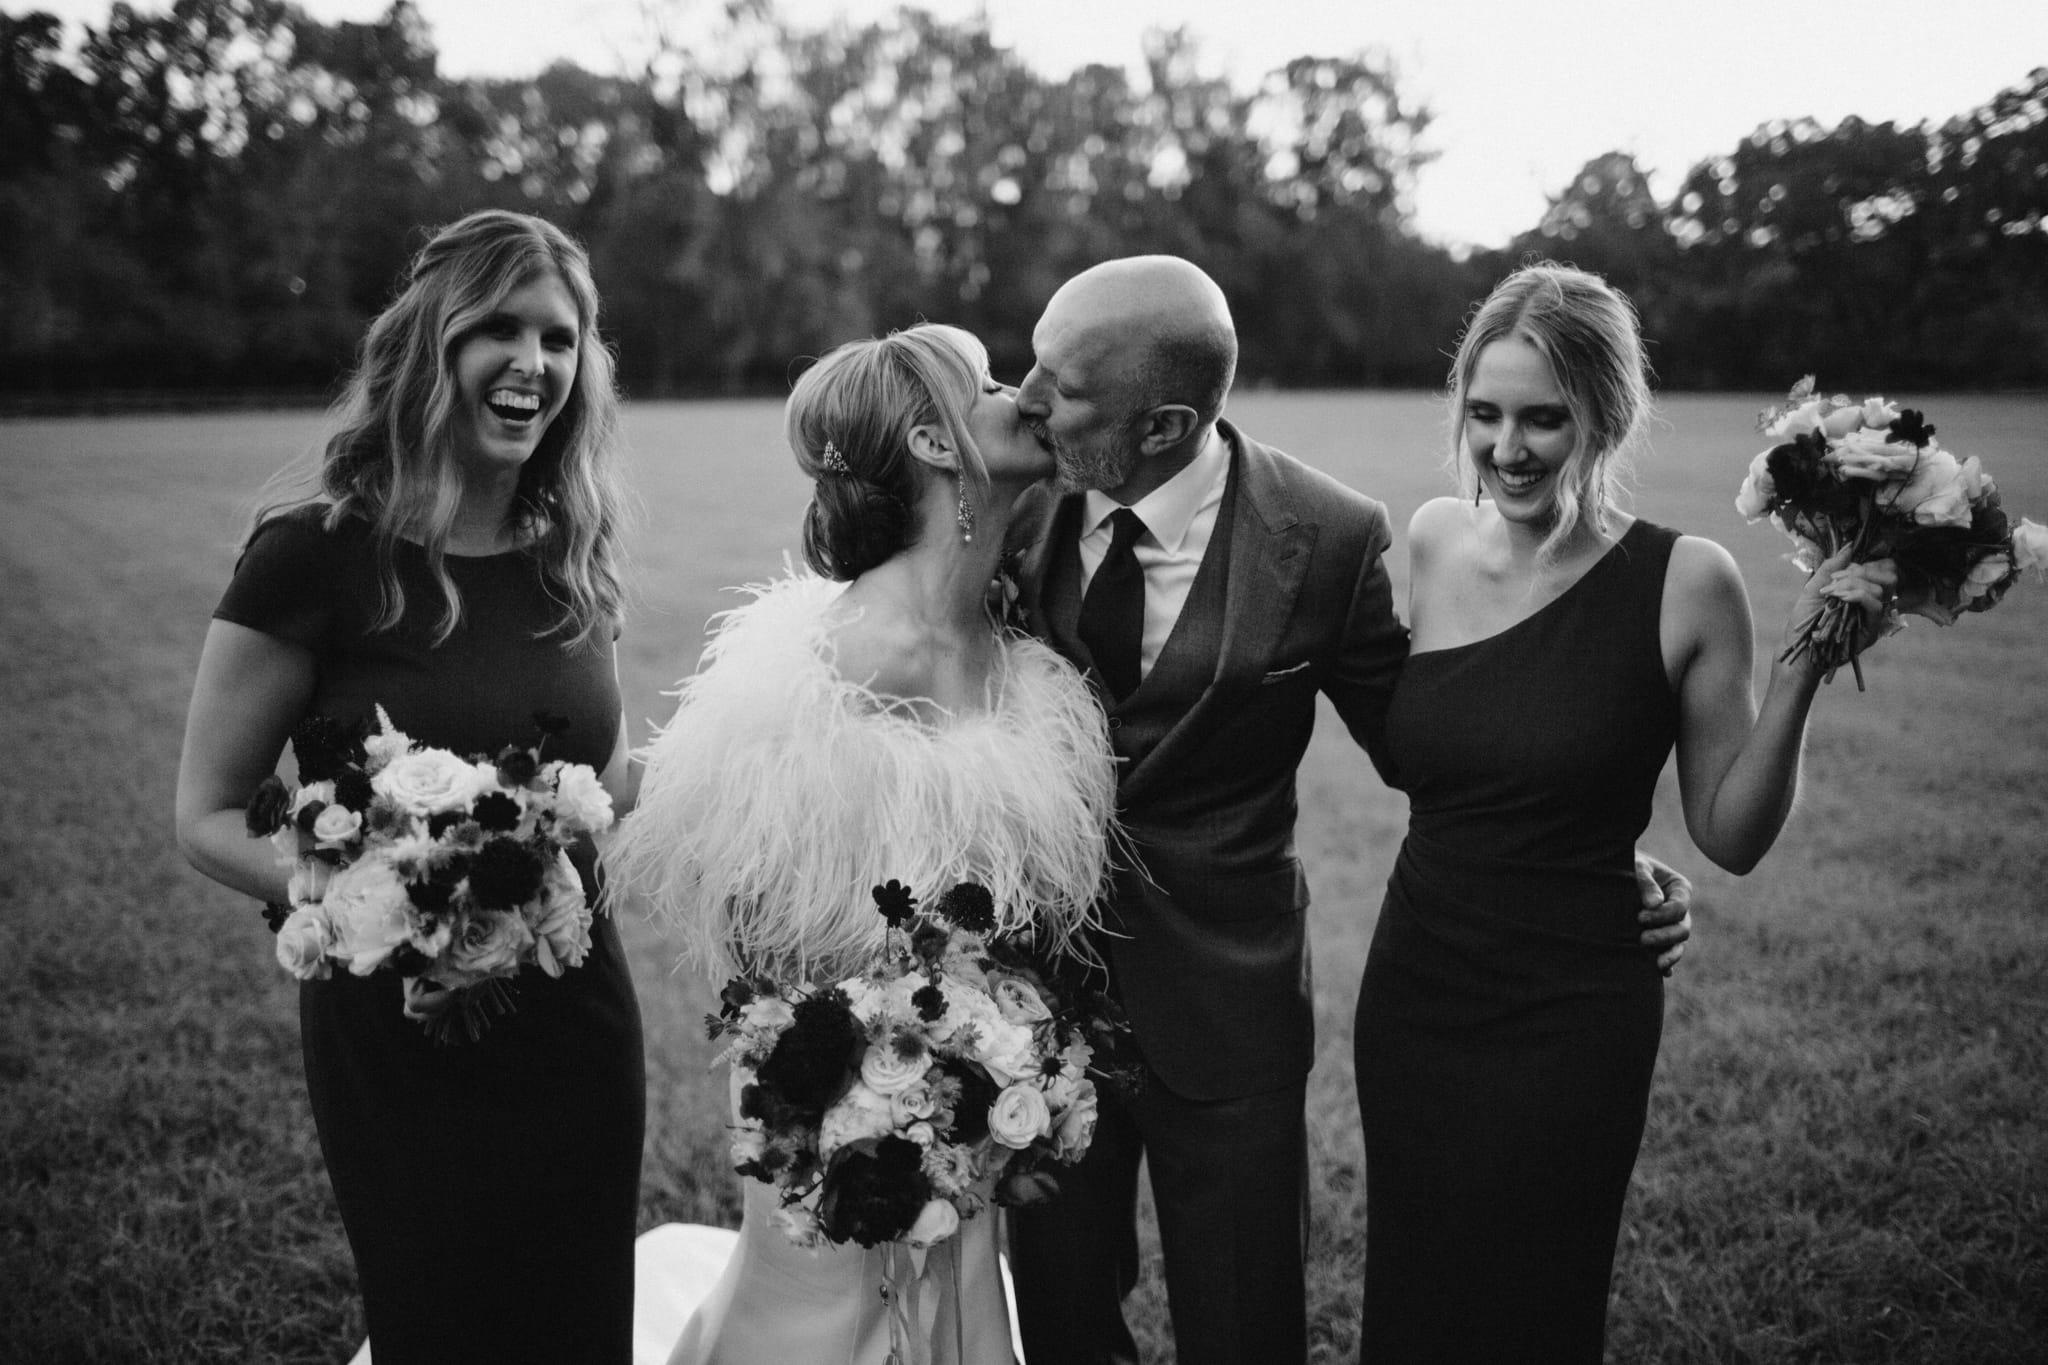 Magnolia-plantation-wedding-charleston-sc.jpg